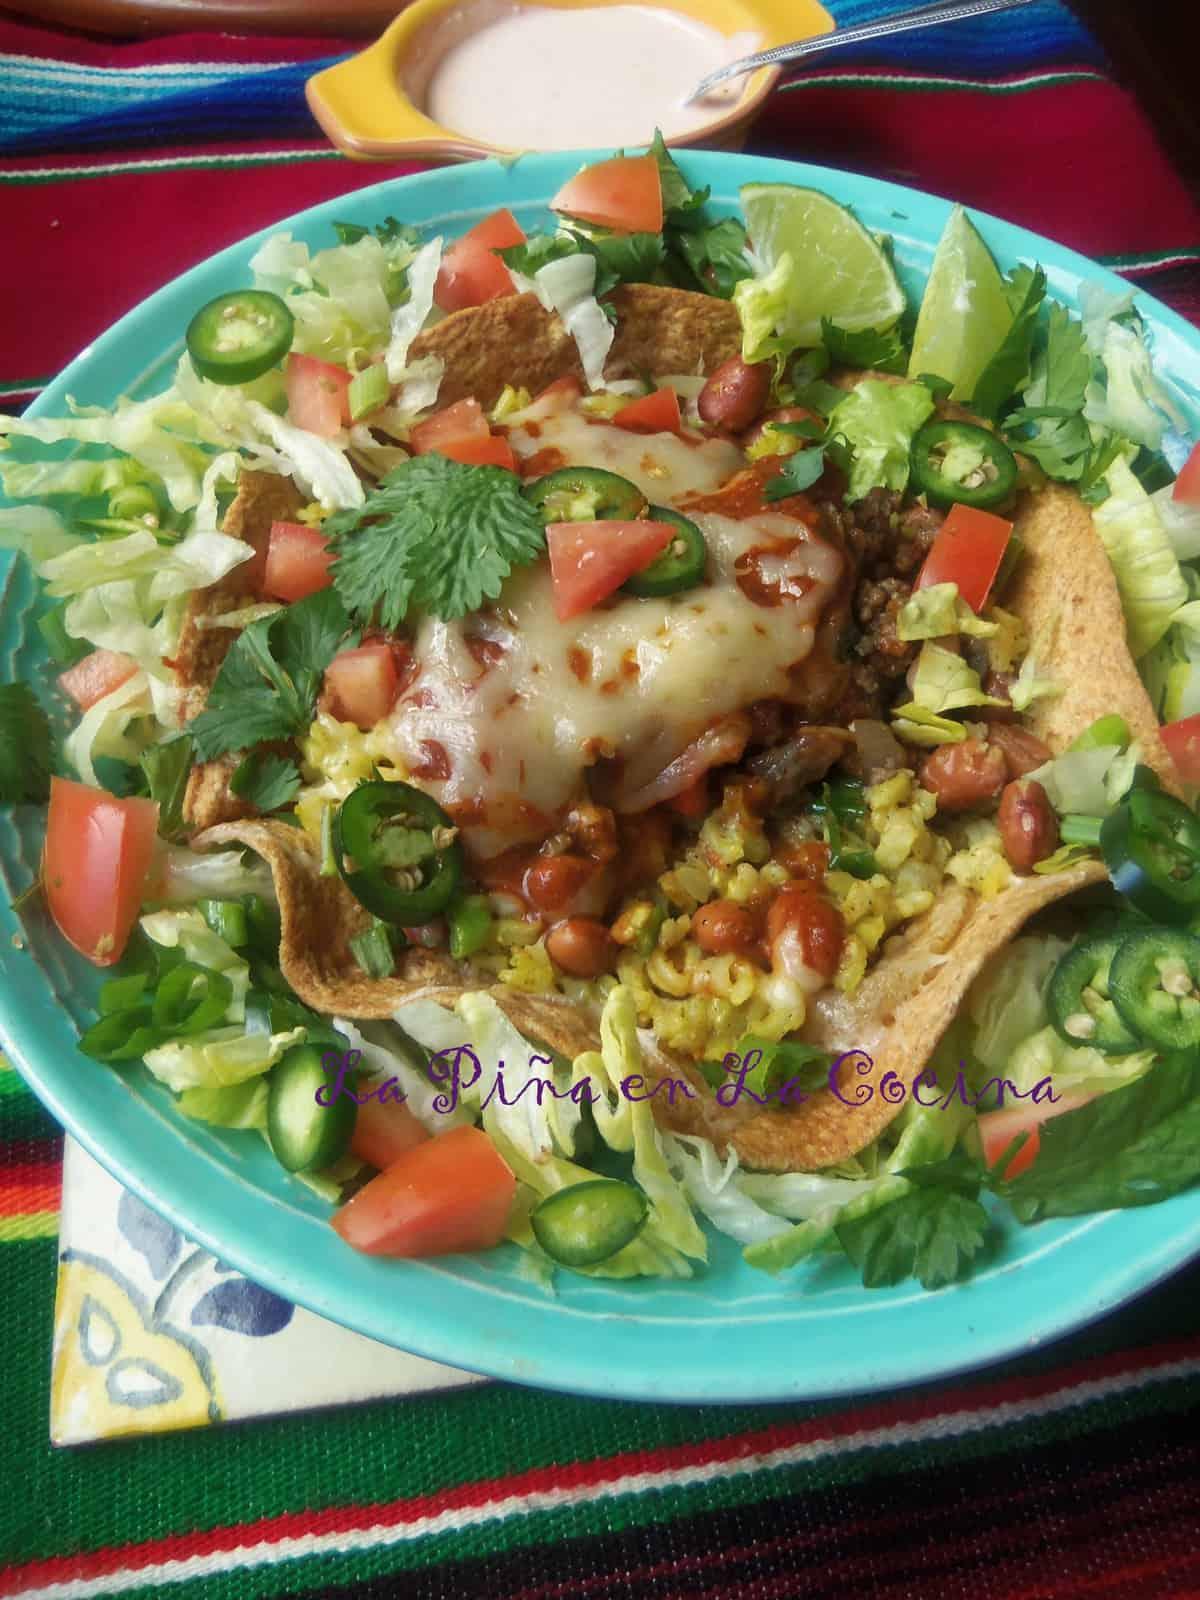 Tex Mex Burrito/Enchilada/Taco Salad Bowl